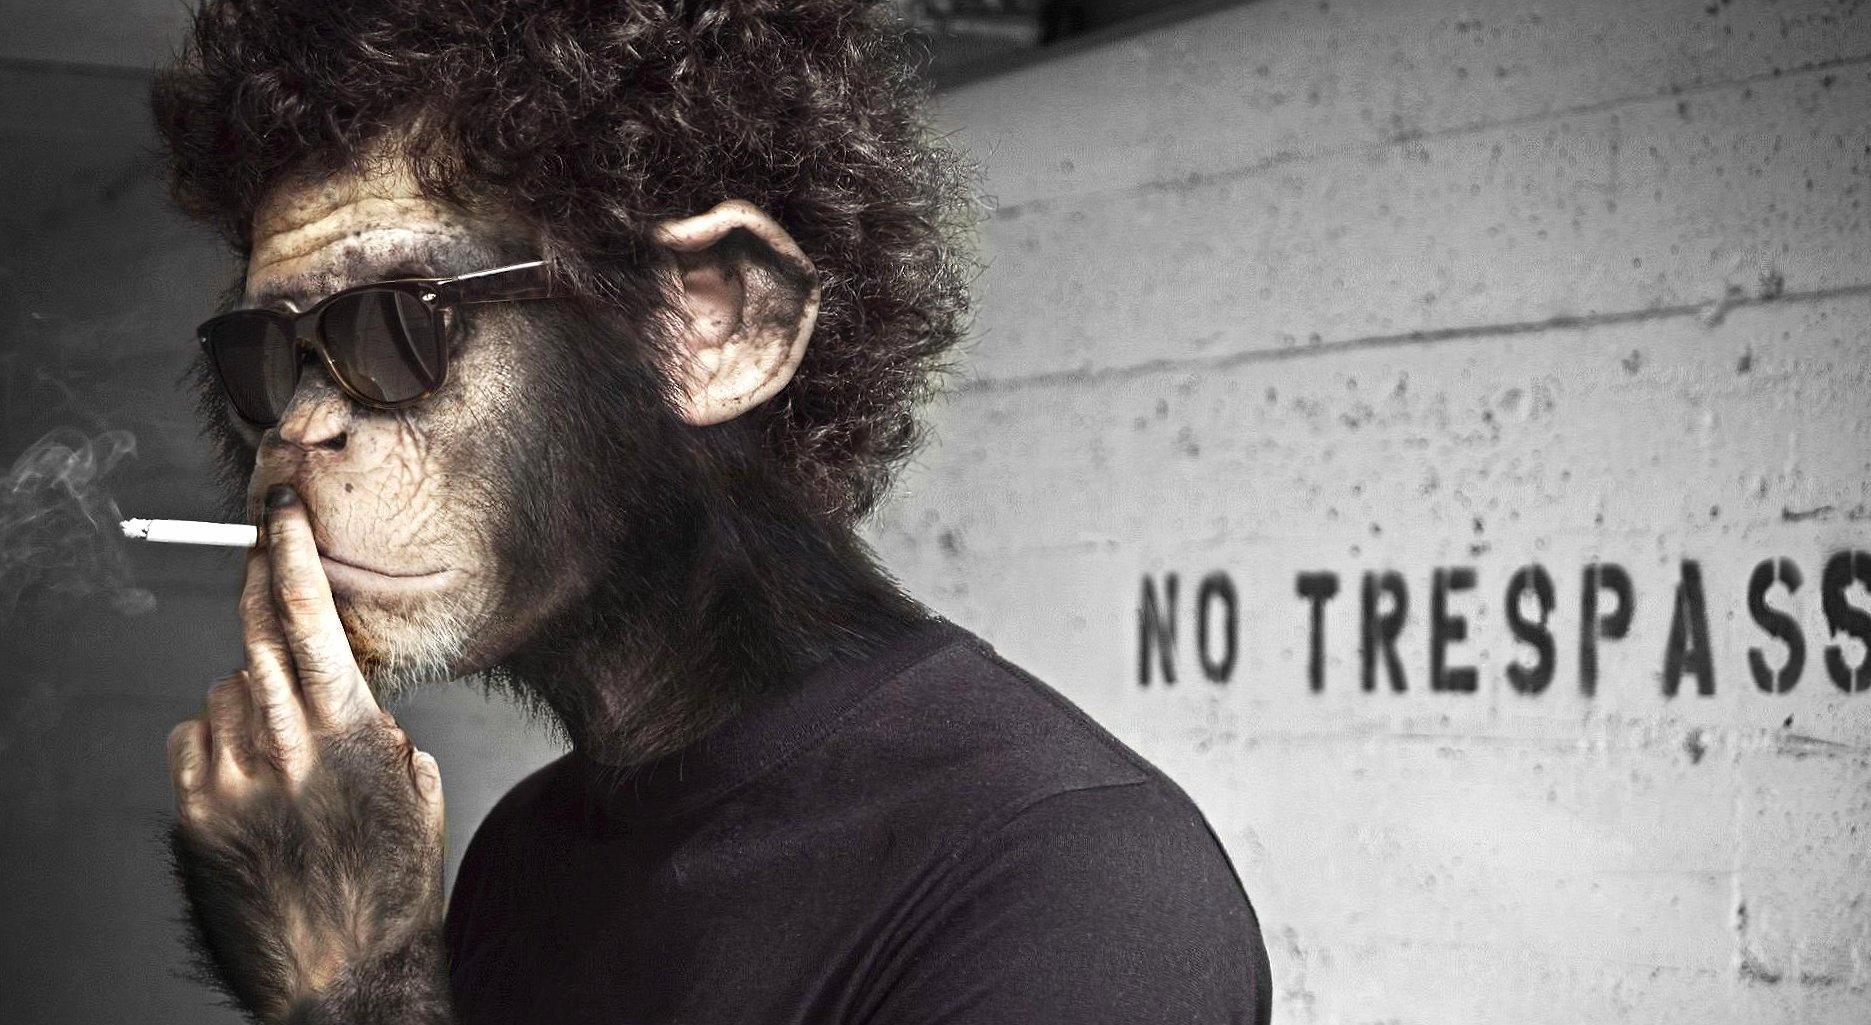 Funny smoking monkey like banksy wallpapers HD quality